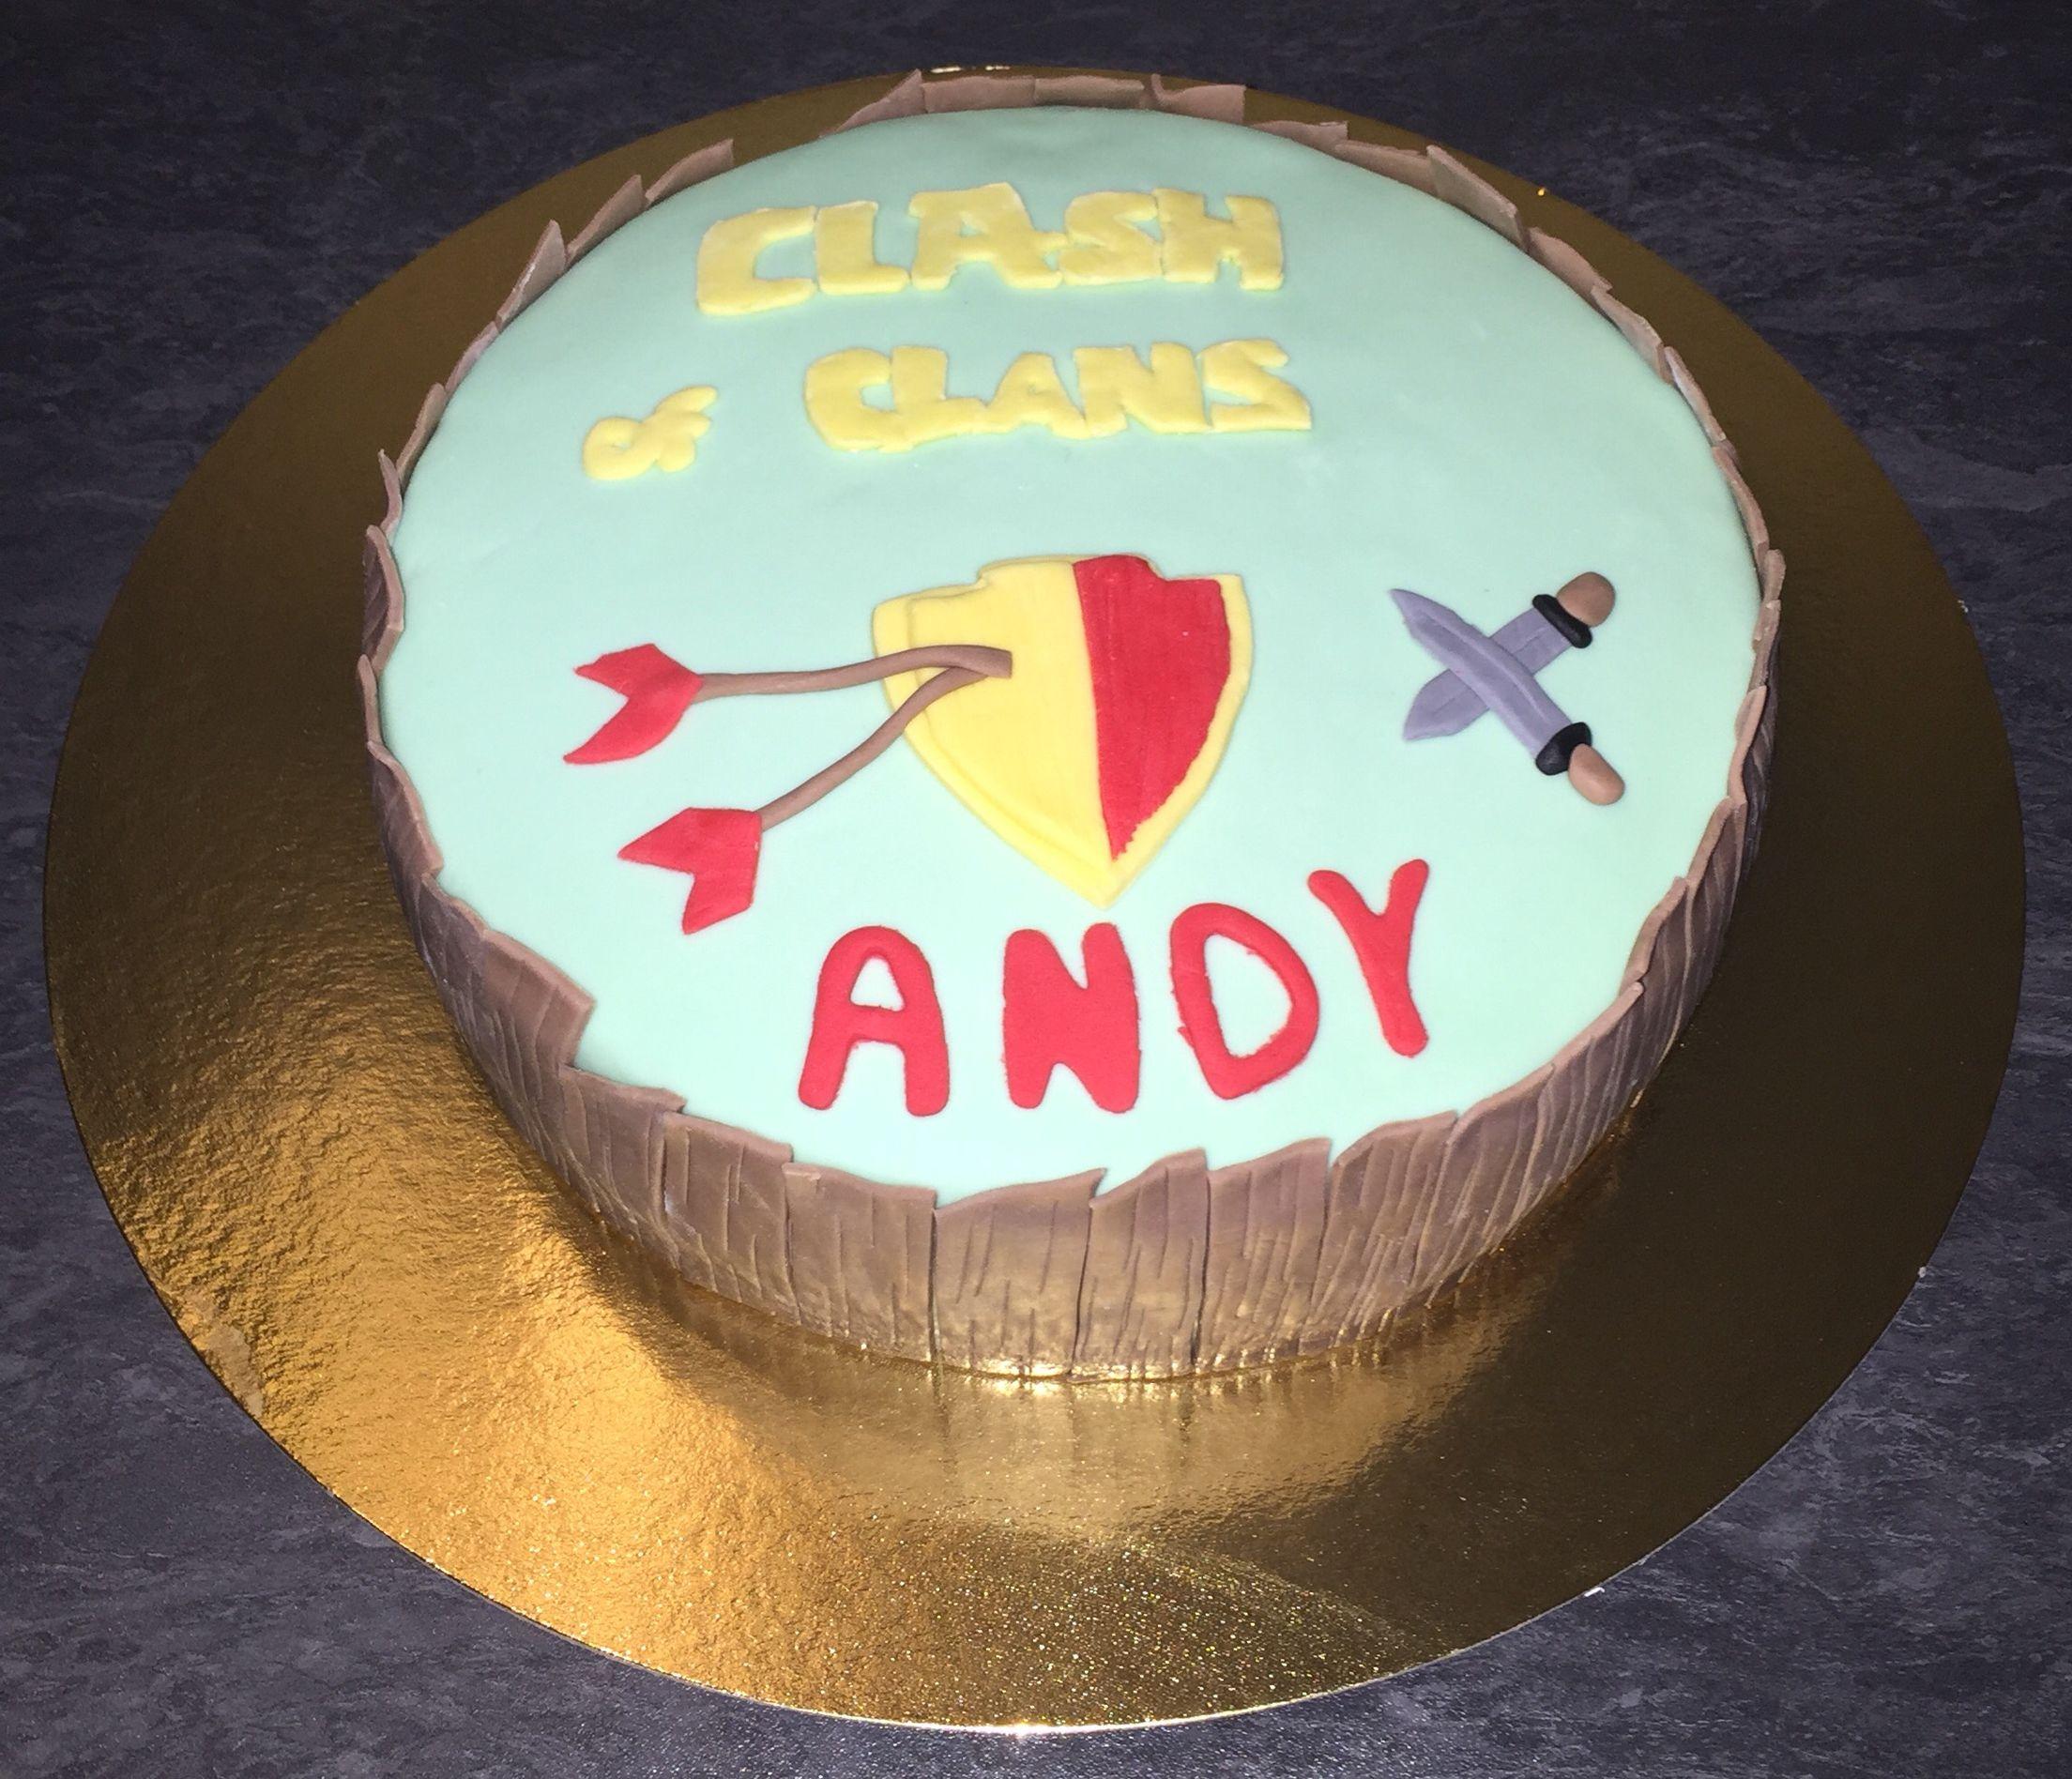 #birthday #cake #clash #of #clan